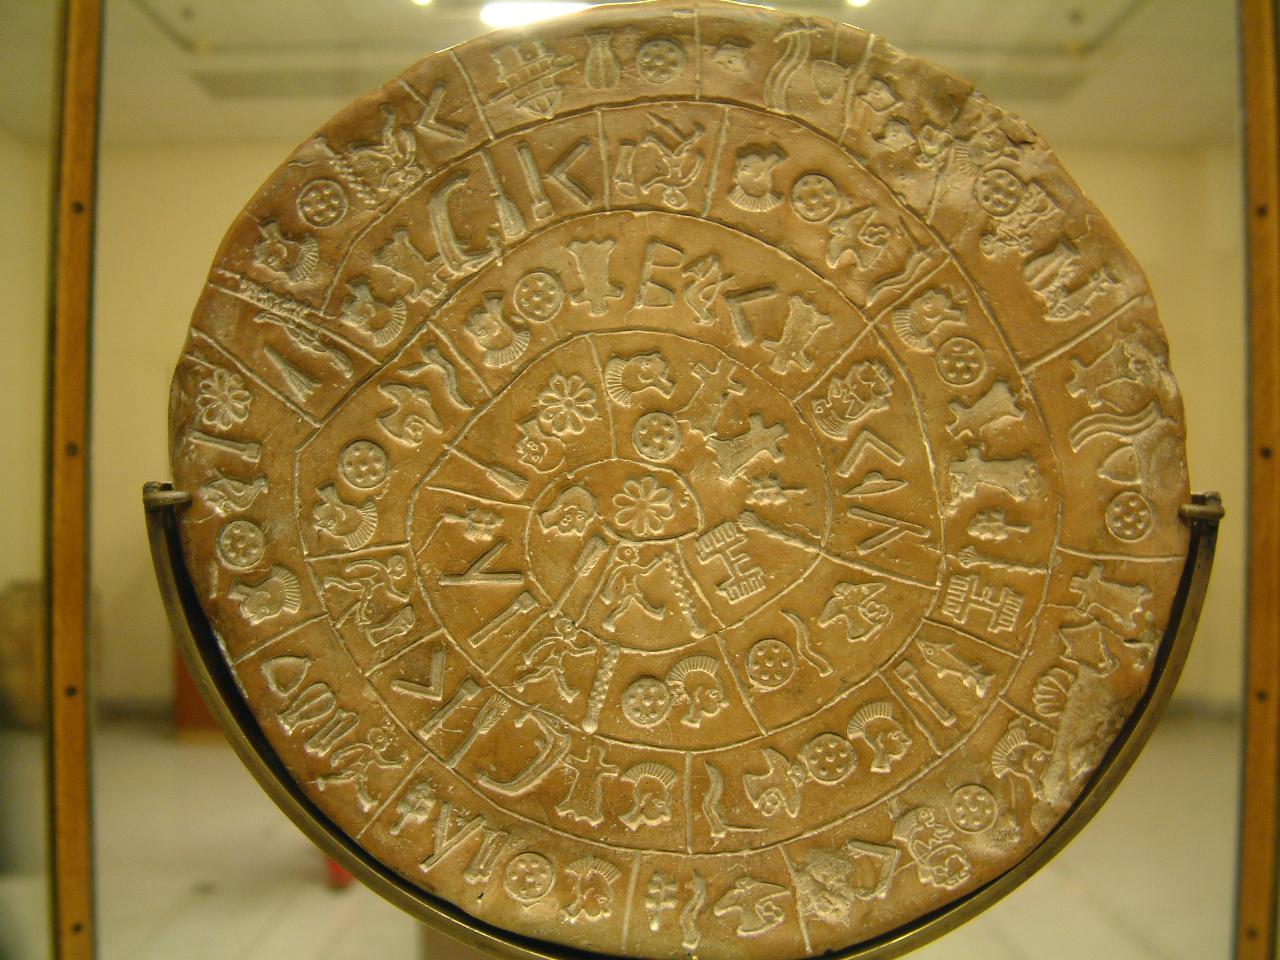 SPIRITUALITY SCIENCE - THE ORIGIN OF MAN - THE ORIGIN OF LANGUAGE: Phaistos Disk, Crete, Greece. Minoan Seal Stones.